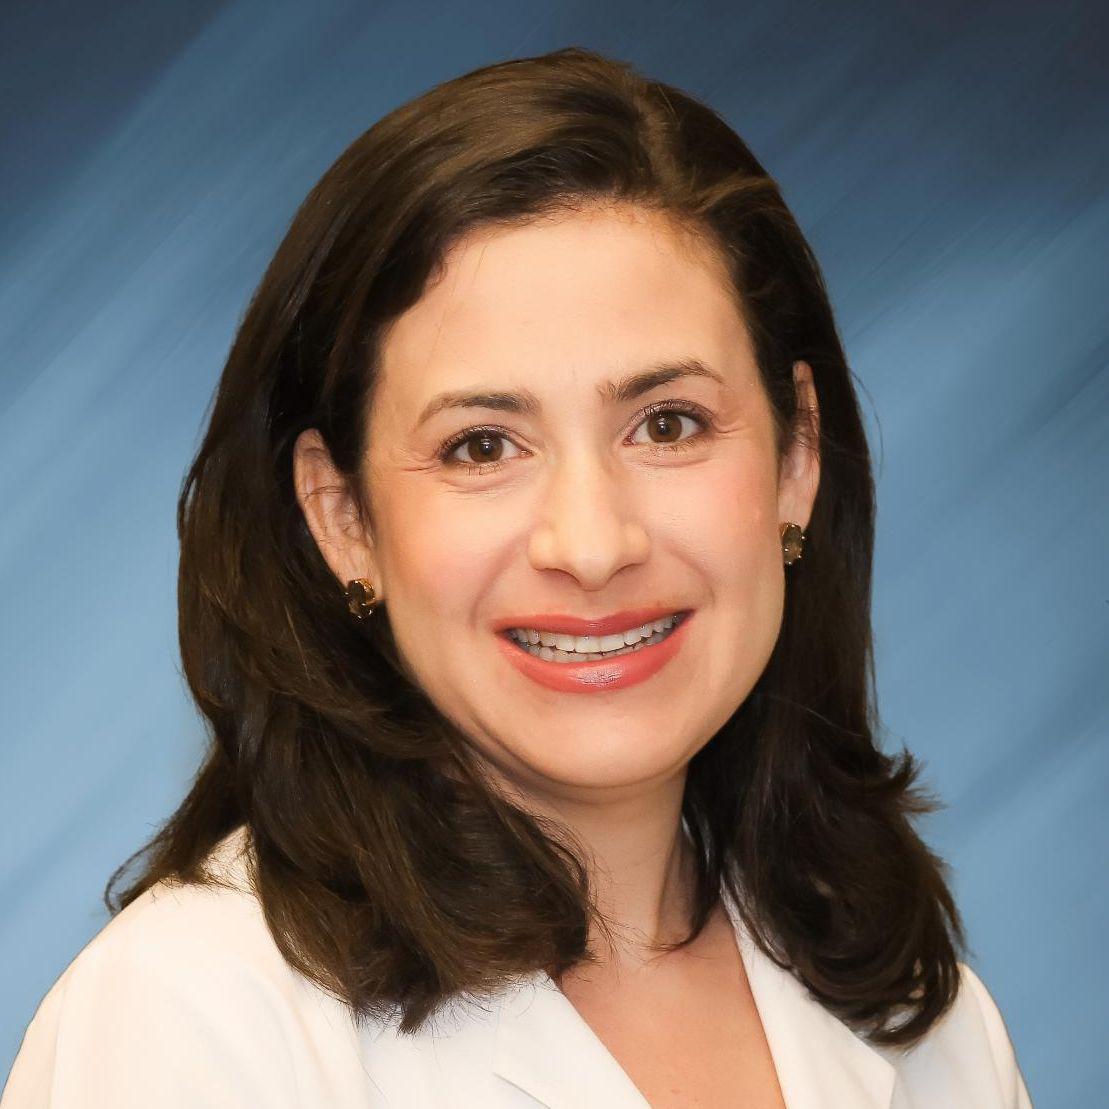 Dr. Rebecca Kosloff